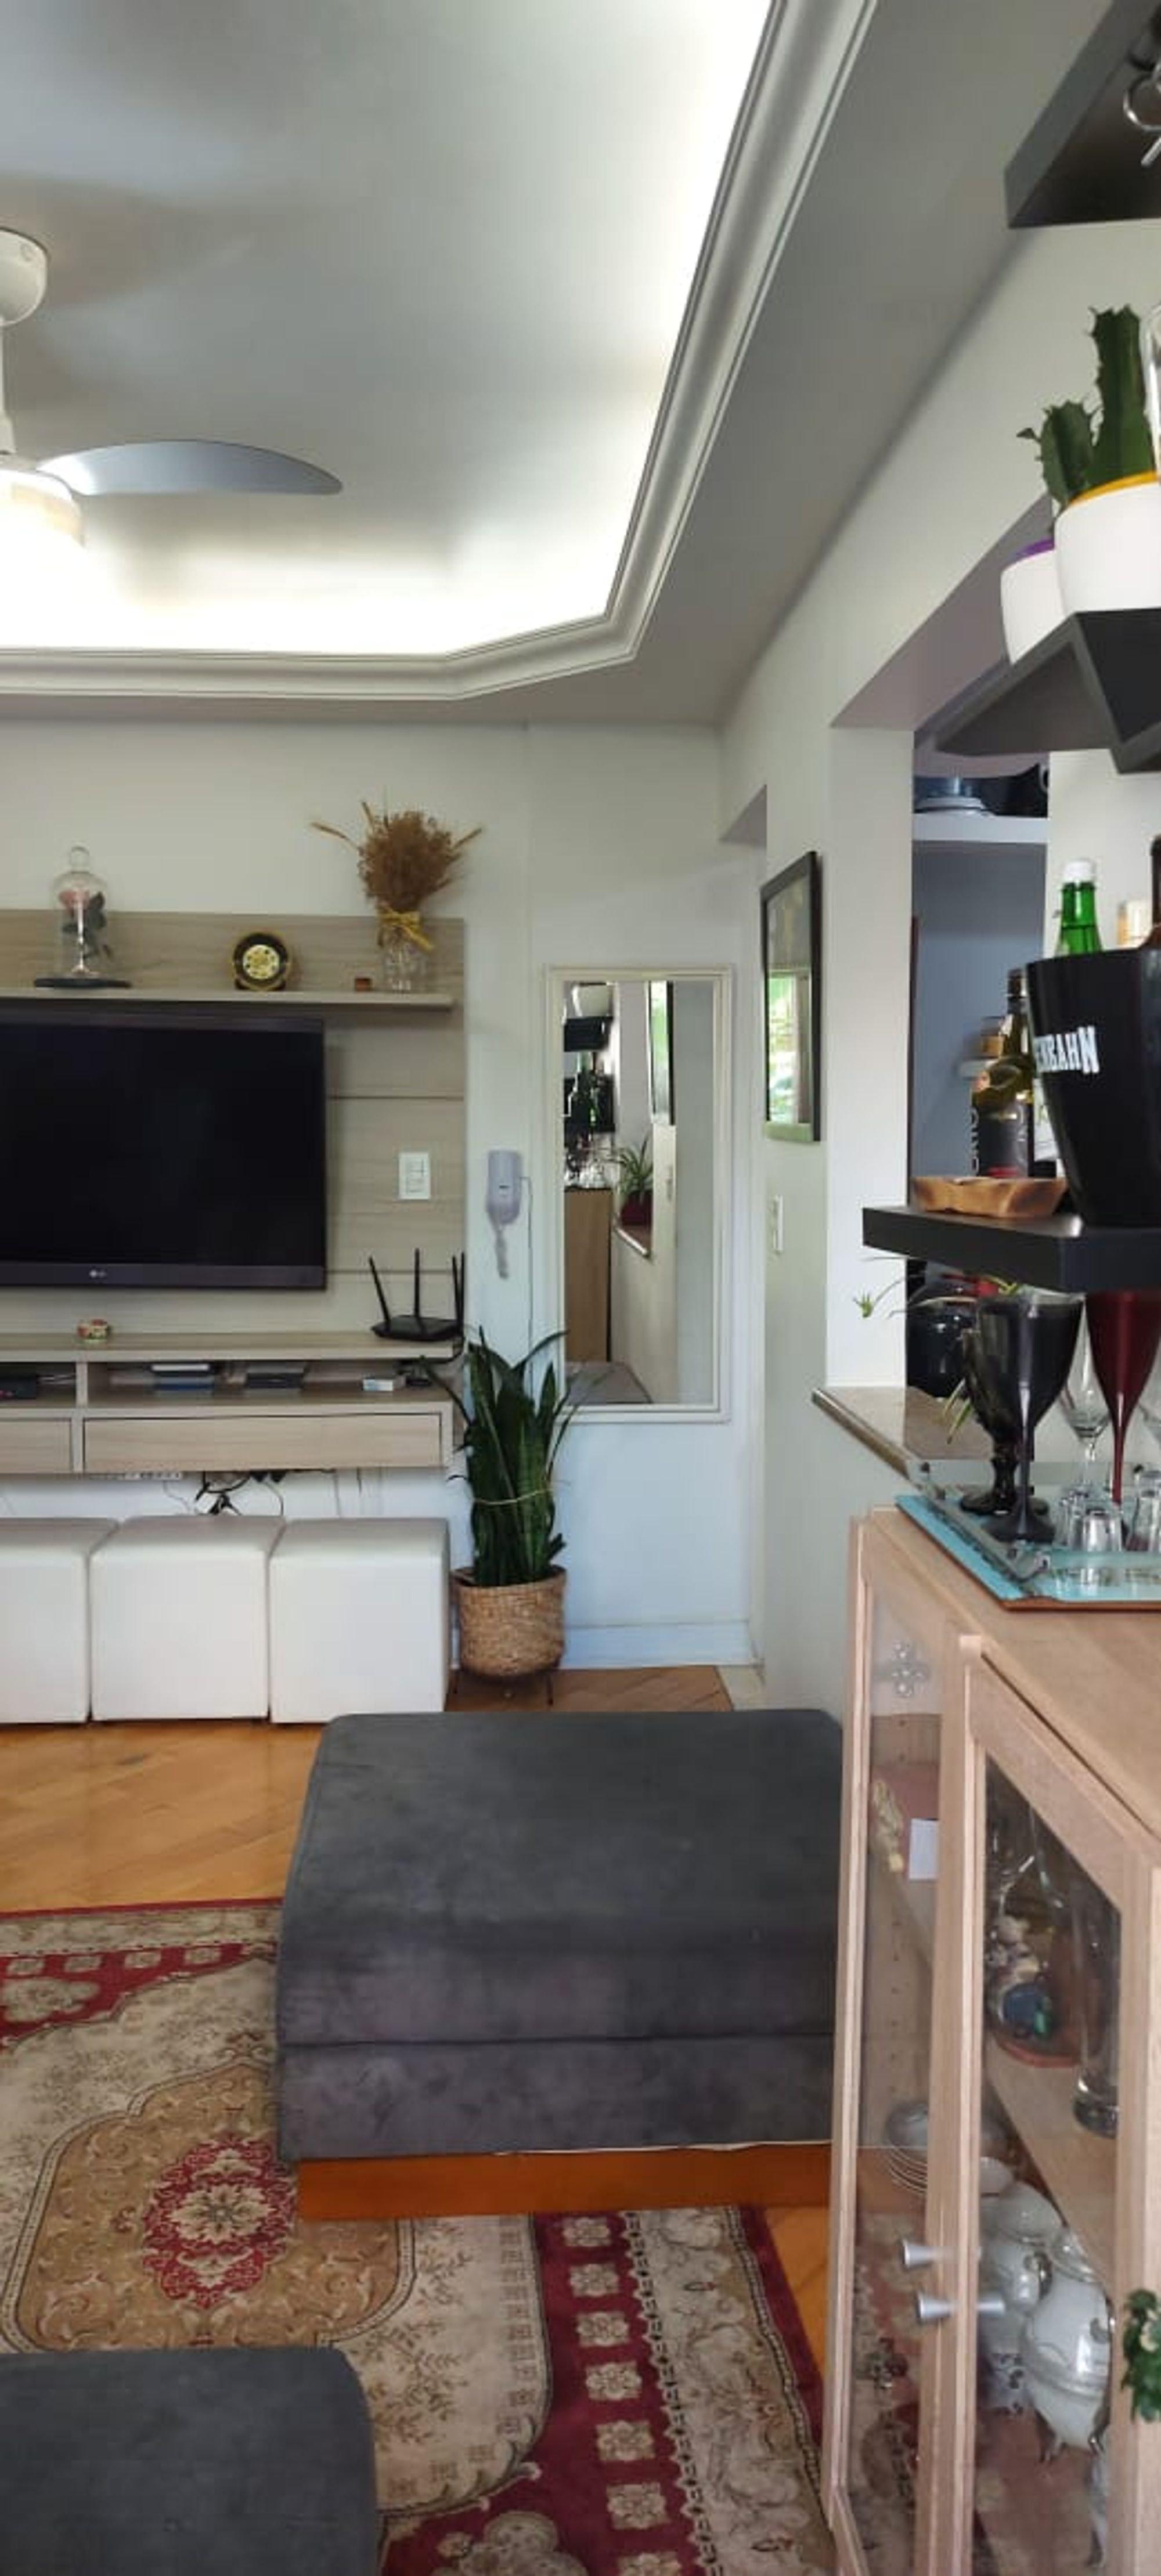 Foto de Sala com vaso de planta, televisão, relógio, garrafa